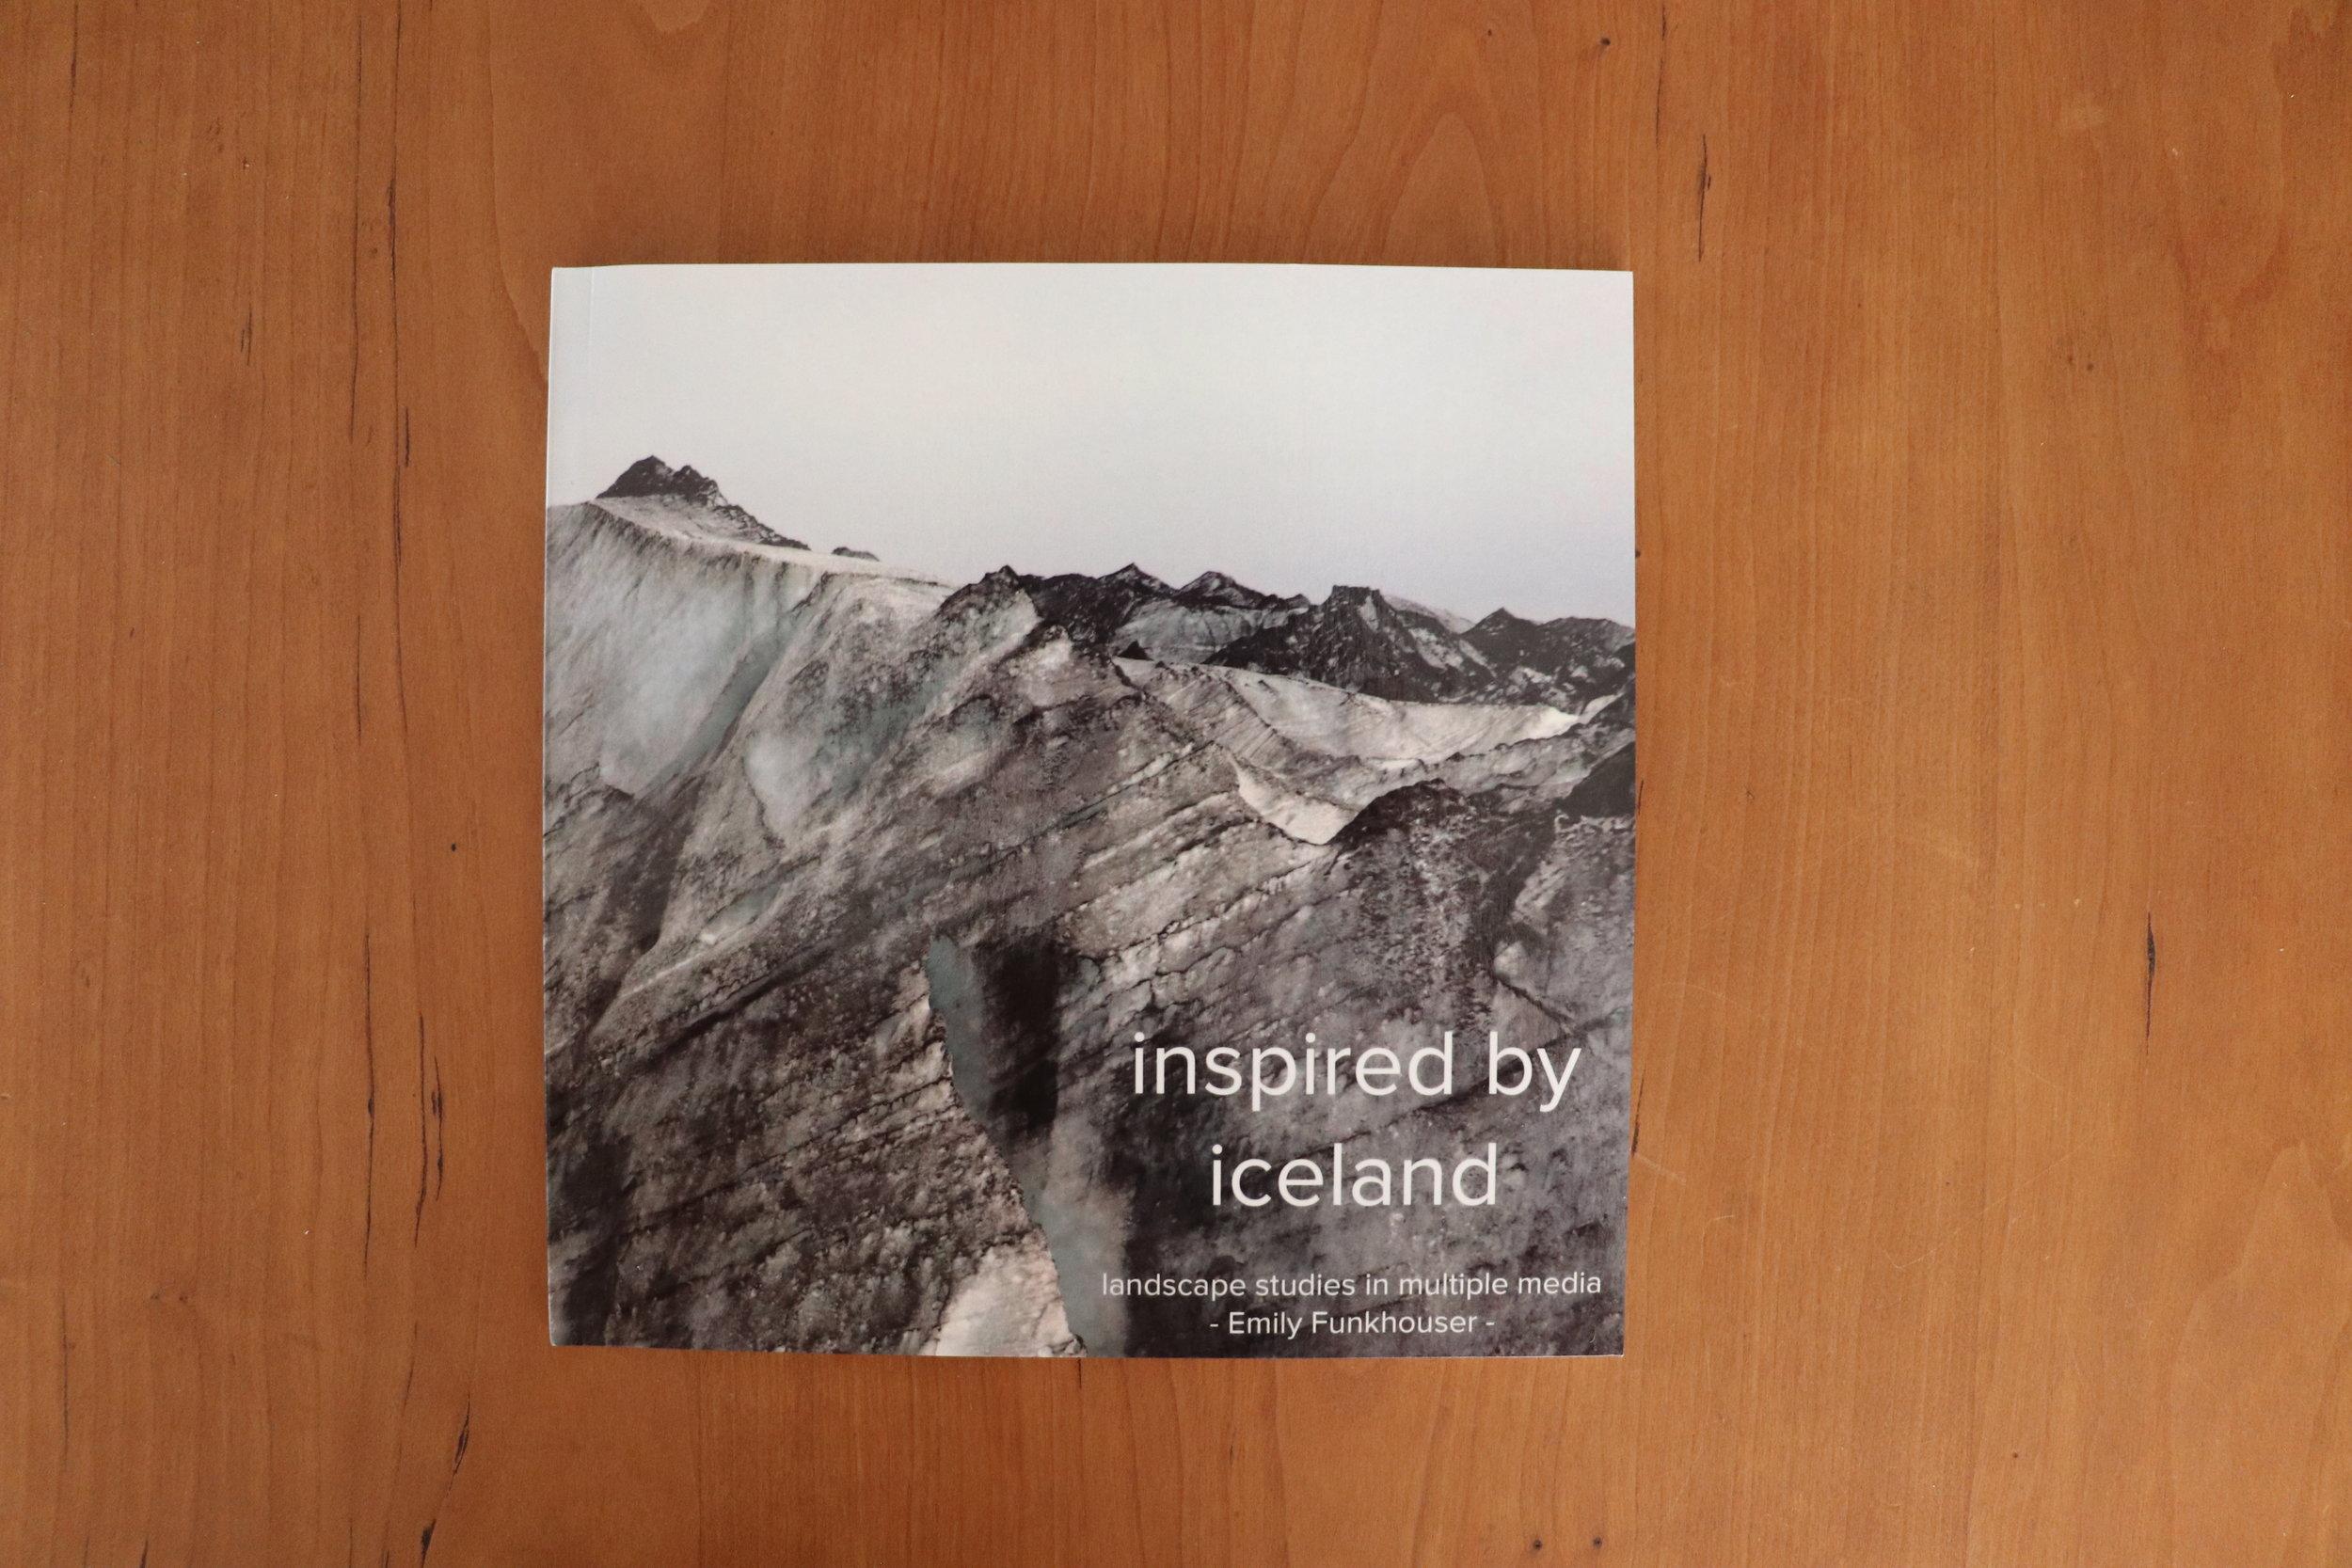 inspiredbyiceland-cover